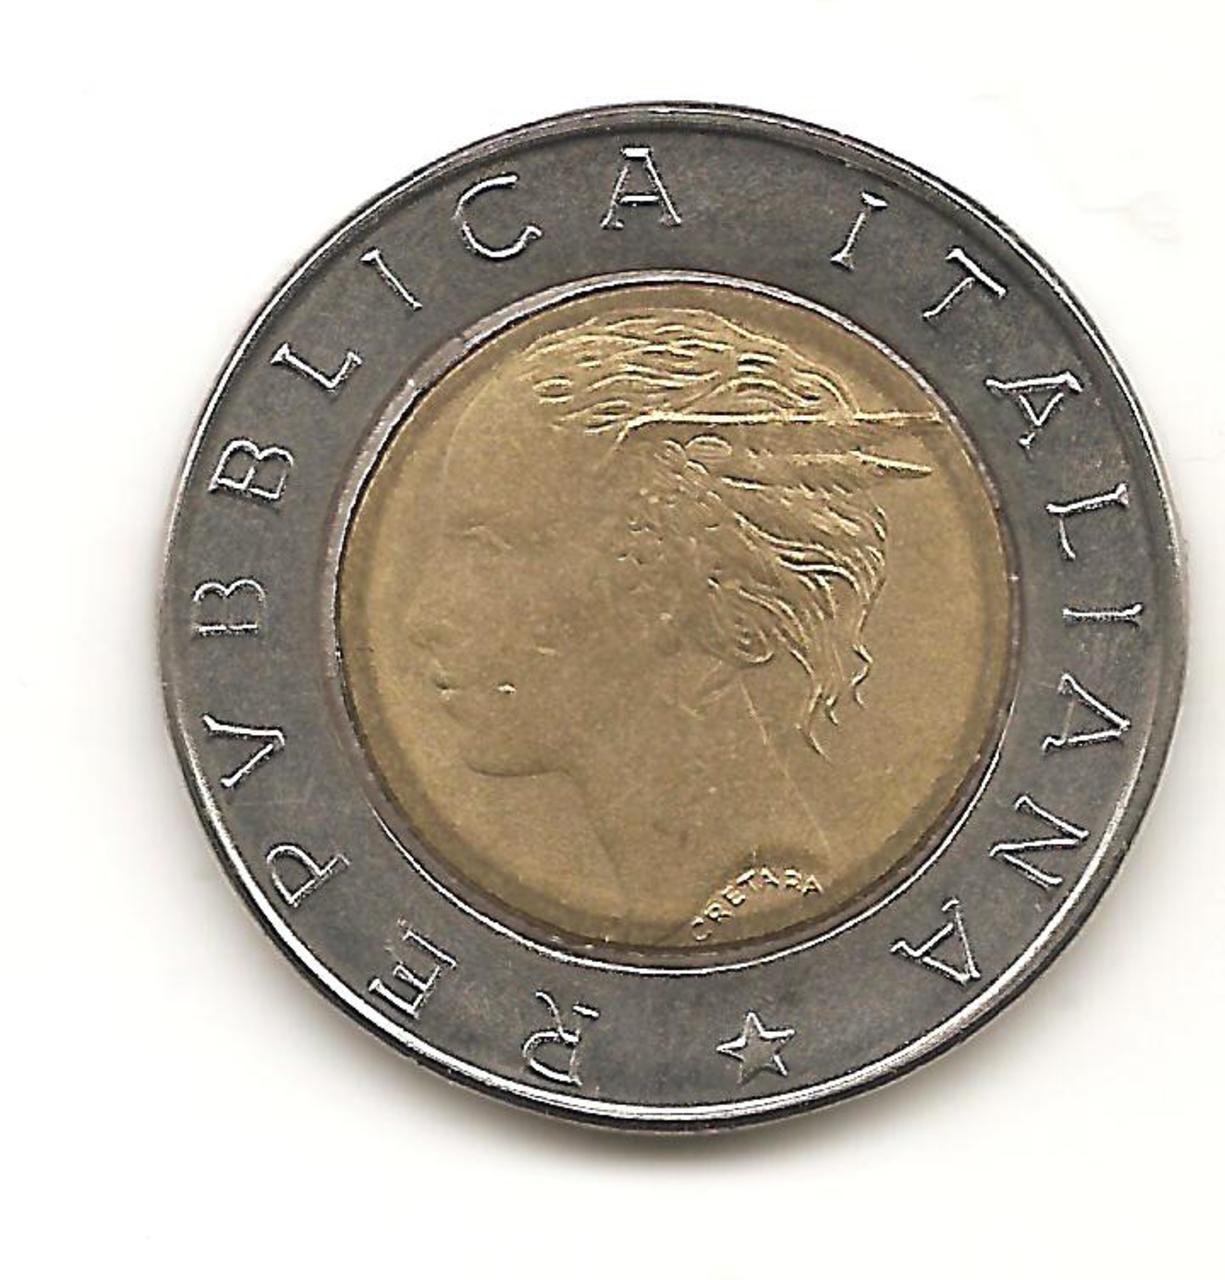 500 Lire. Italia. 1994. Roma  Image